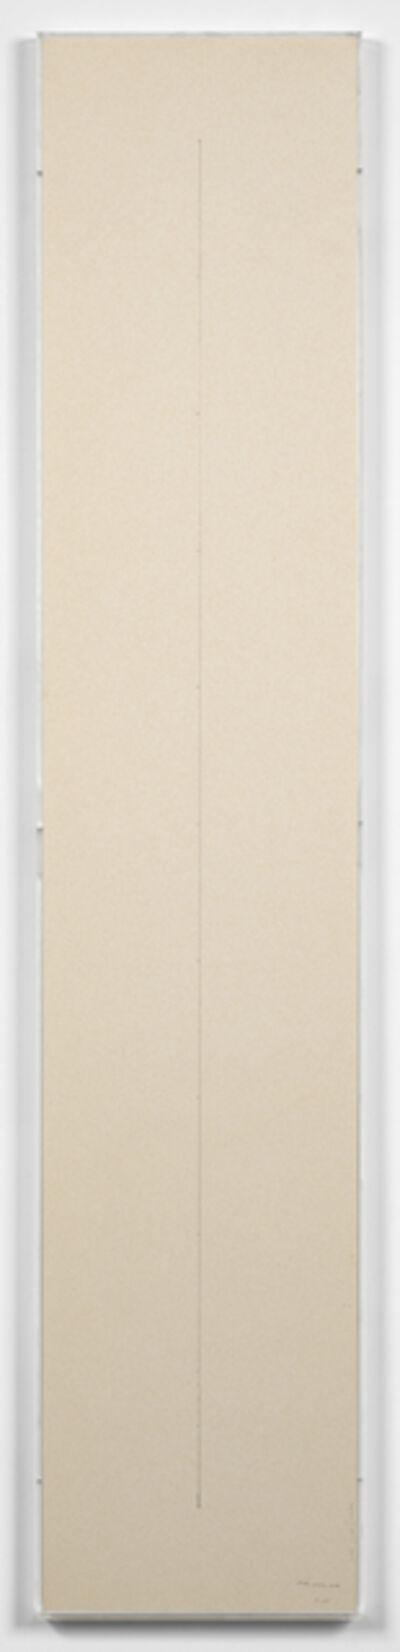 Stanley Brouwn, '10 mm, 10 cm, 10 dm', 1976